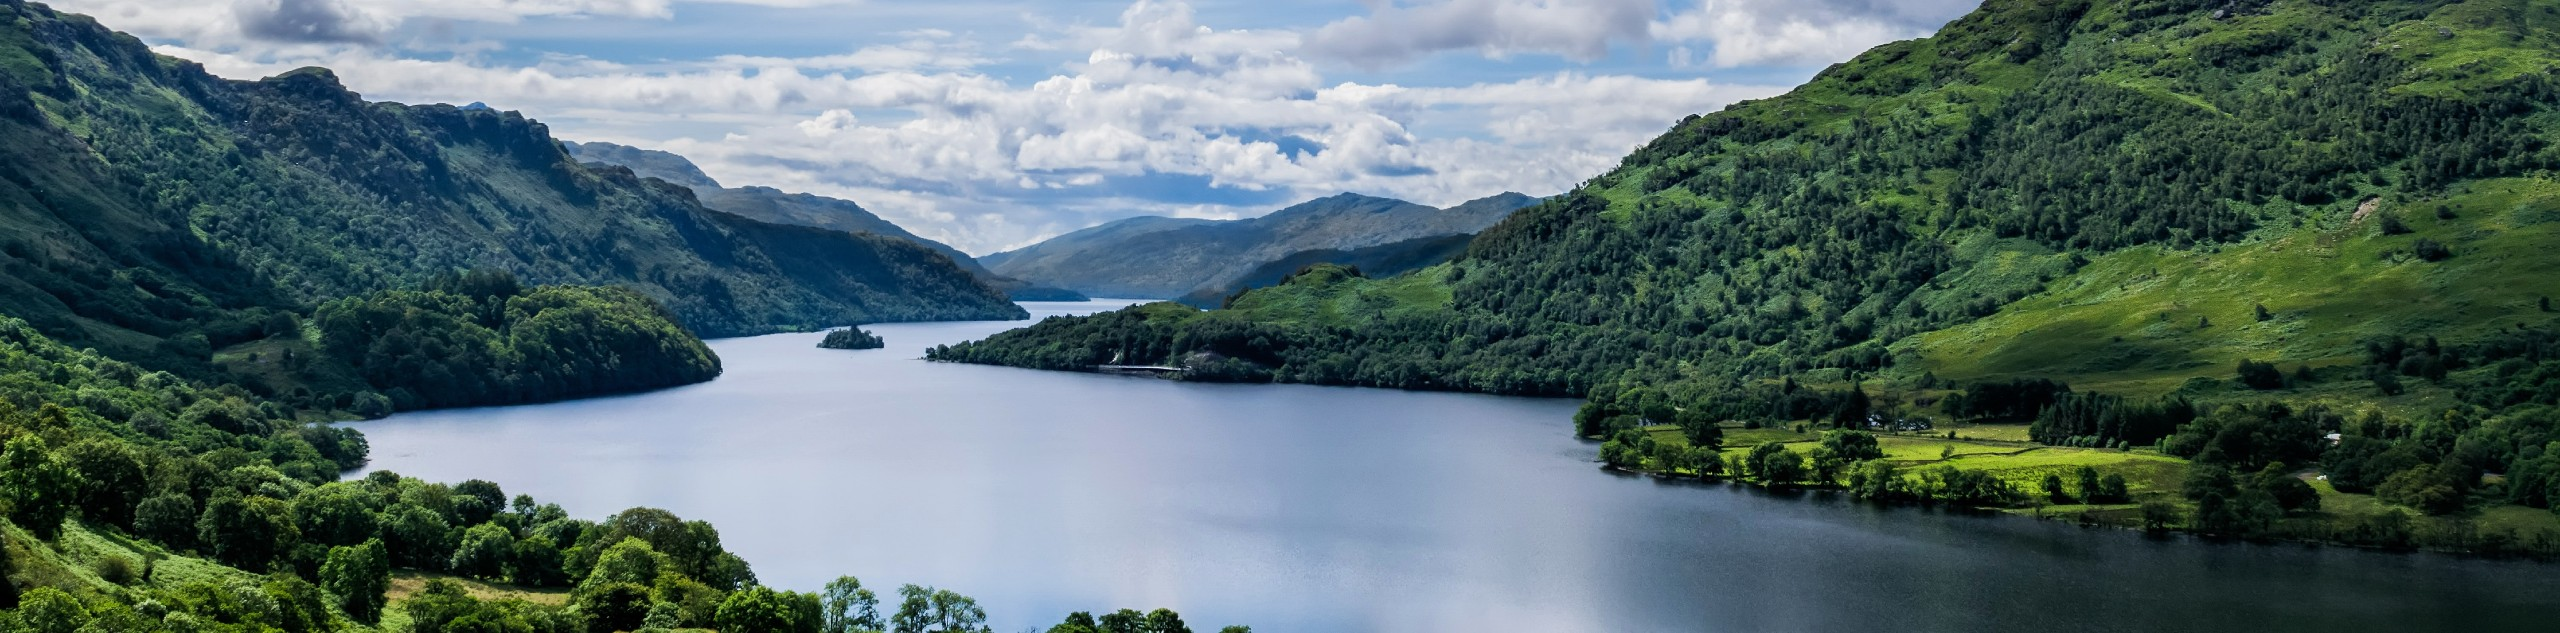 Loch Lomond and Cowal Way Walk